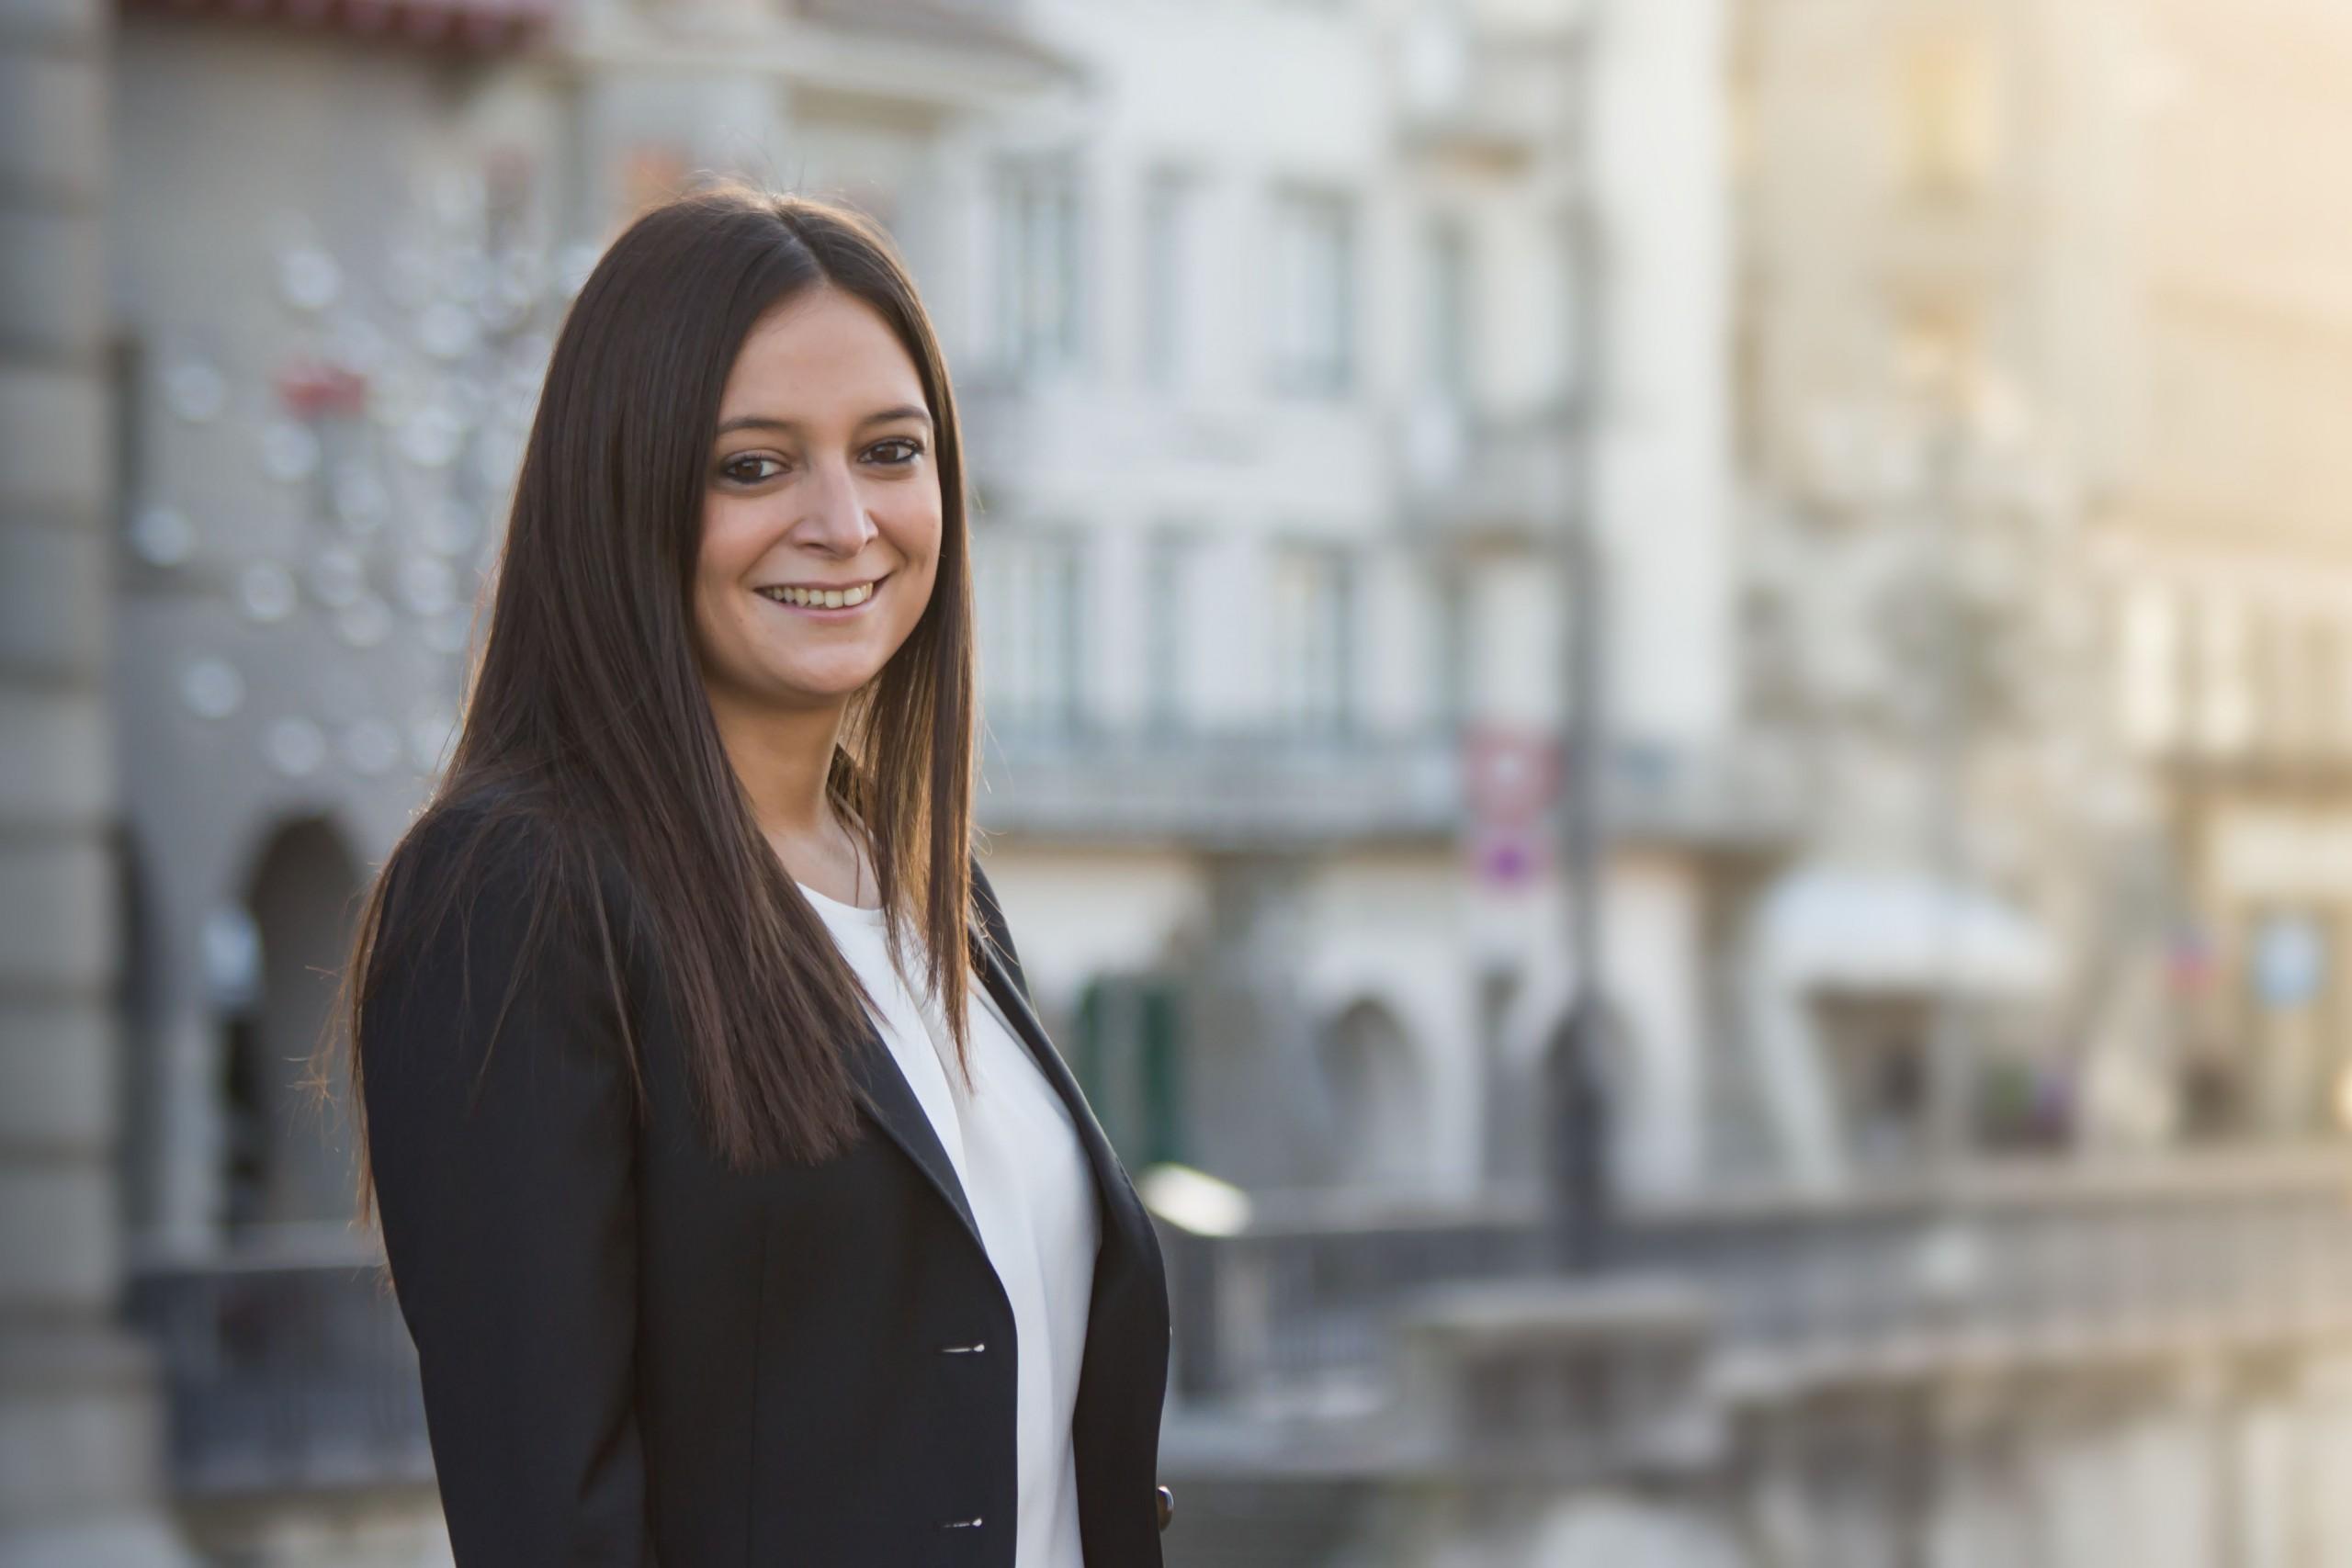 Patricia Jäggi: Anwalt Arbeitsrecht, Anwalt Strafrecht, Anwalt Strassenverkehrsrecht, Anwalt Vertragsrecht, Anwalt Familienrecht, Anwalt Migrationsrecht